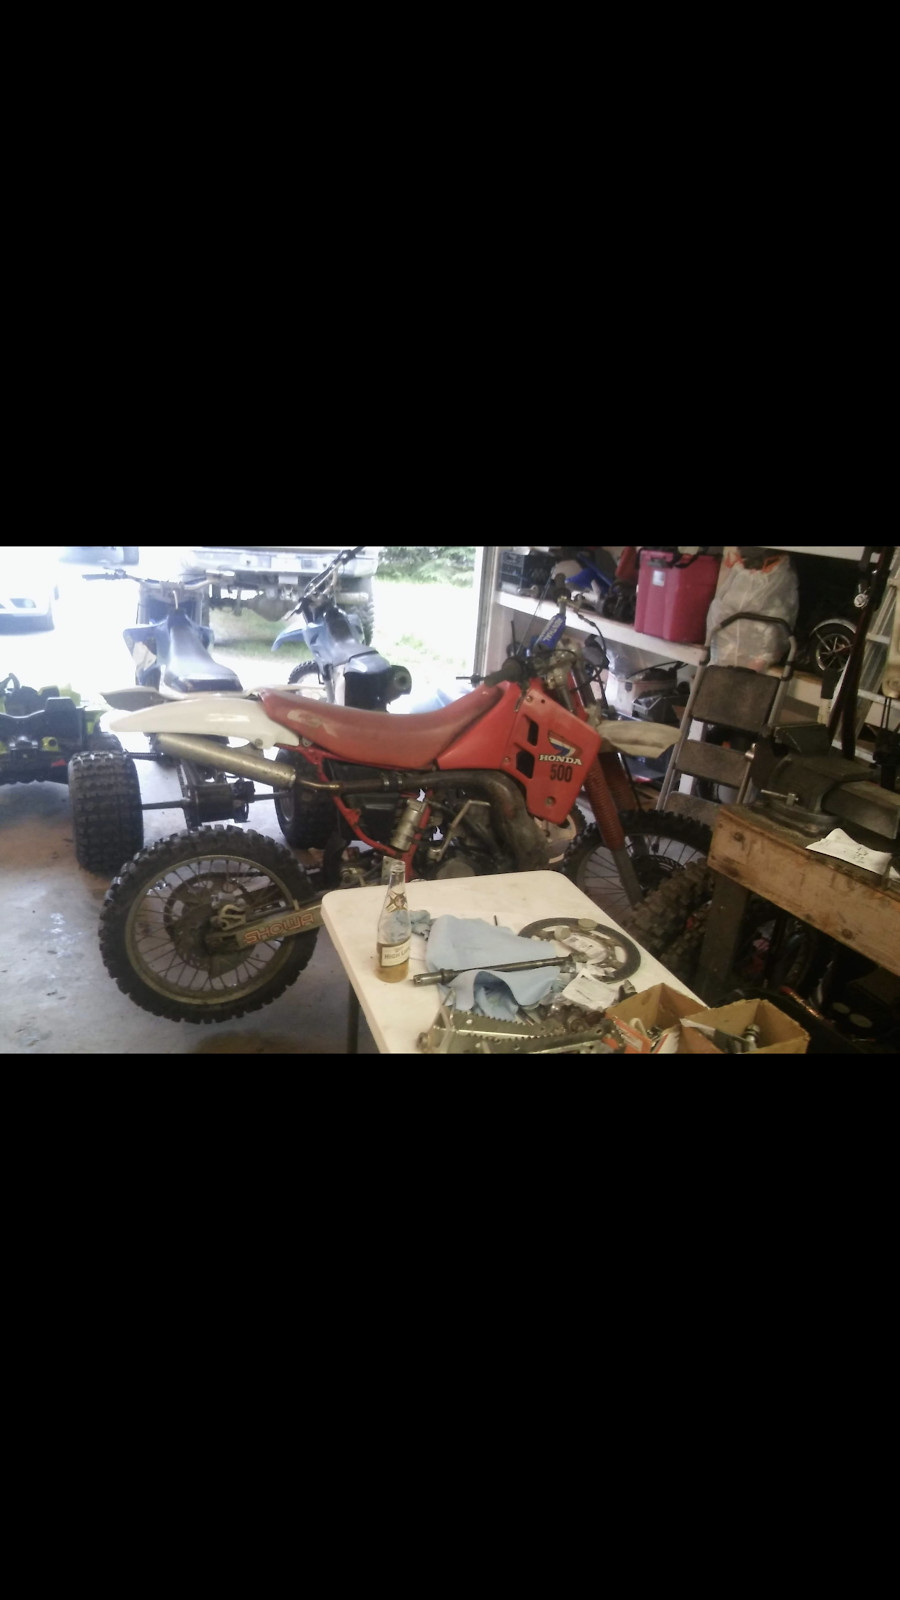 EBDF71D1-5A18-468E-8E0D-813B8246FB52 - NateWeltzin - Motocross Pictures - Vital MX